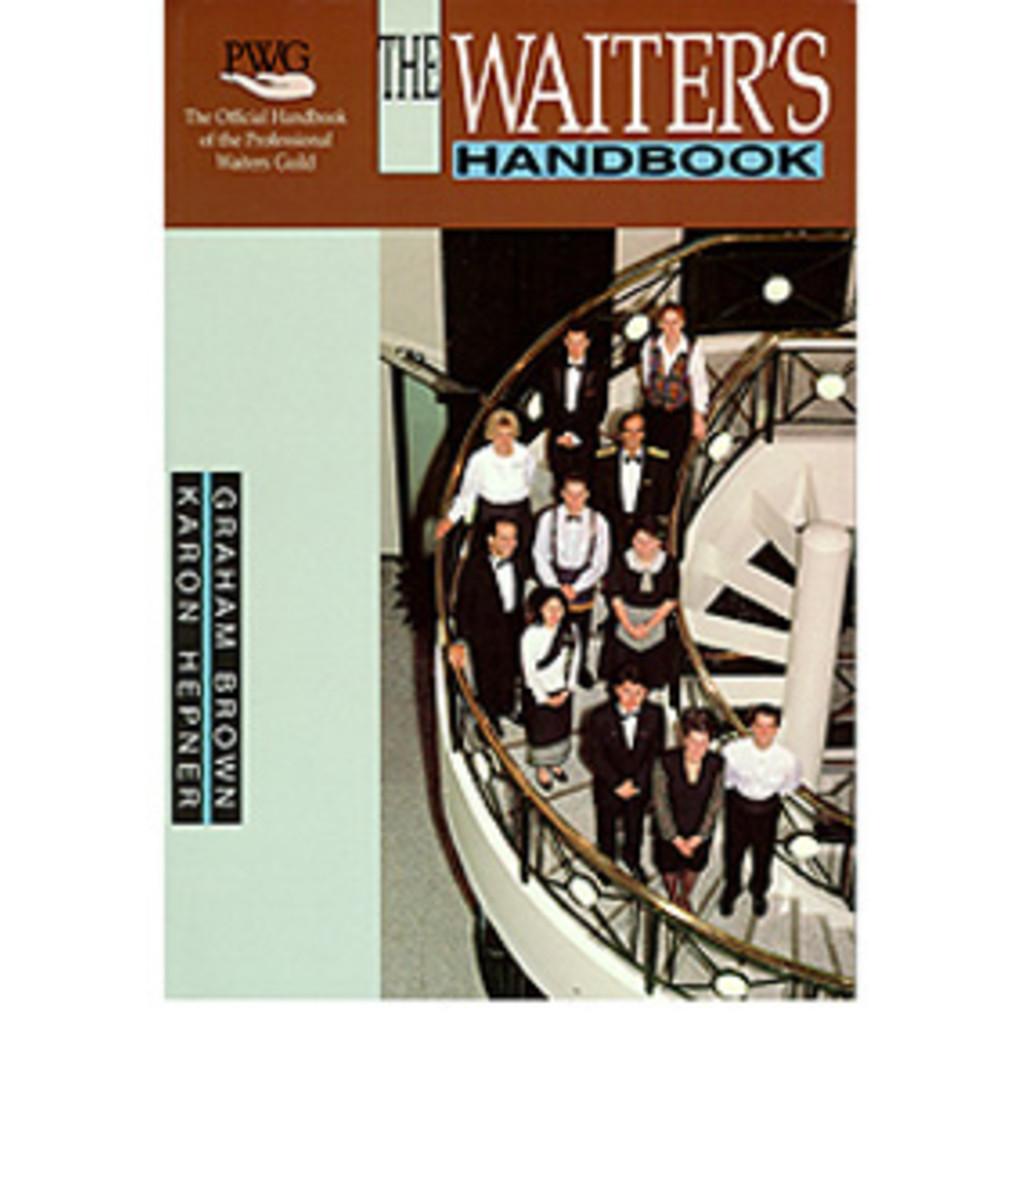 The Waiter's Handbook 3rd Edition